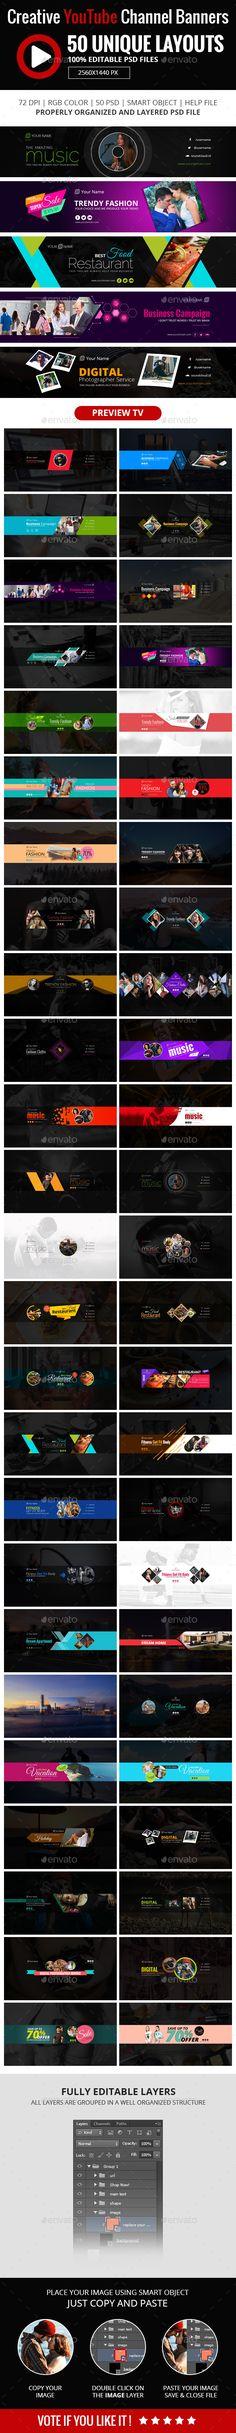 50 Multipurpose YouTube Channel Art - #YouTube #Social Media Download here: https://graphicriver.net/item/50-multipurpose-youtube-channel-art/19491497?ref=alena994